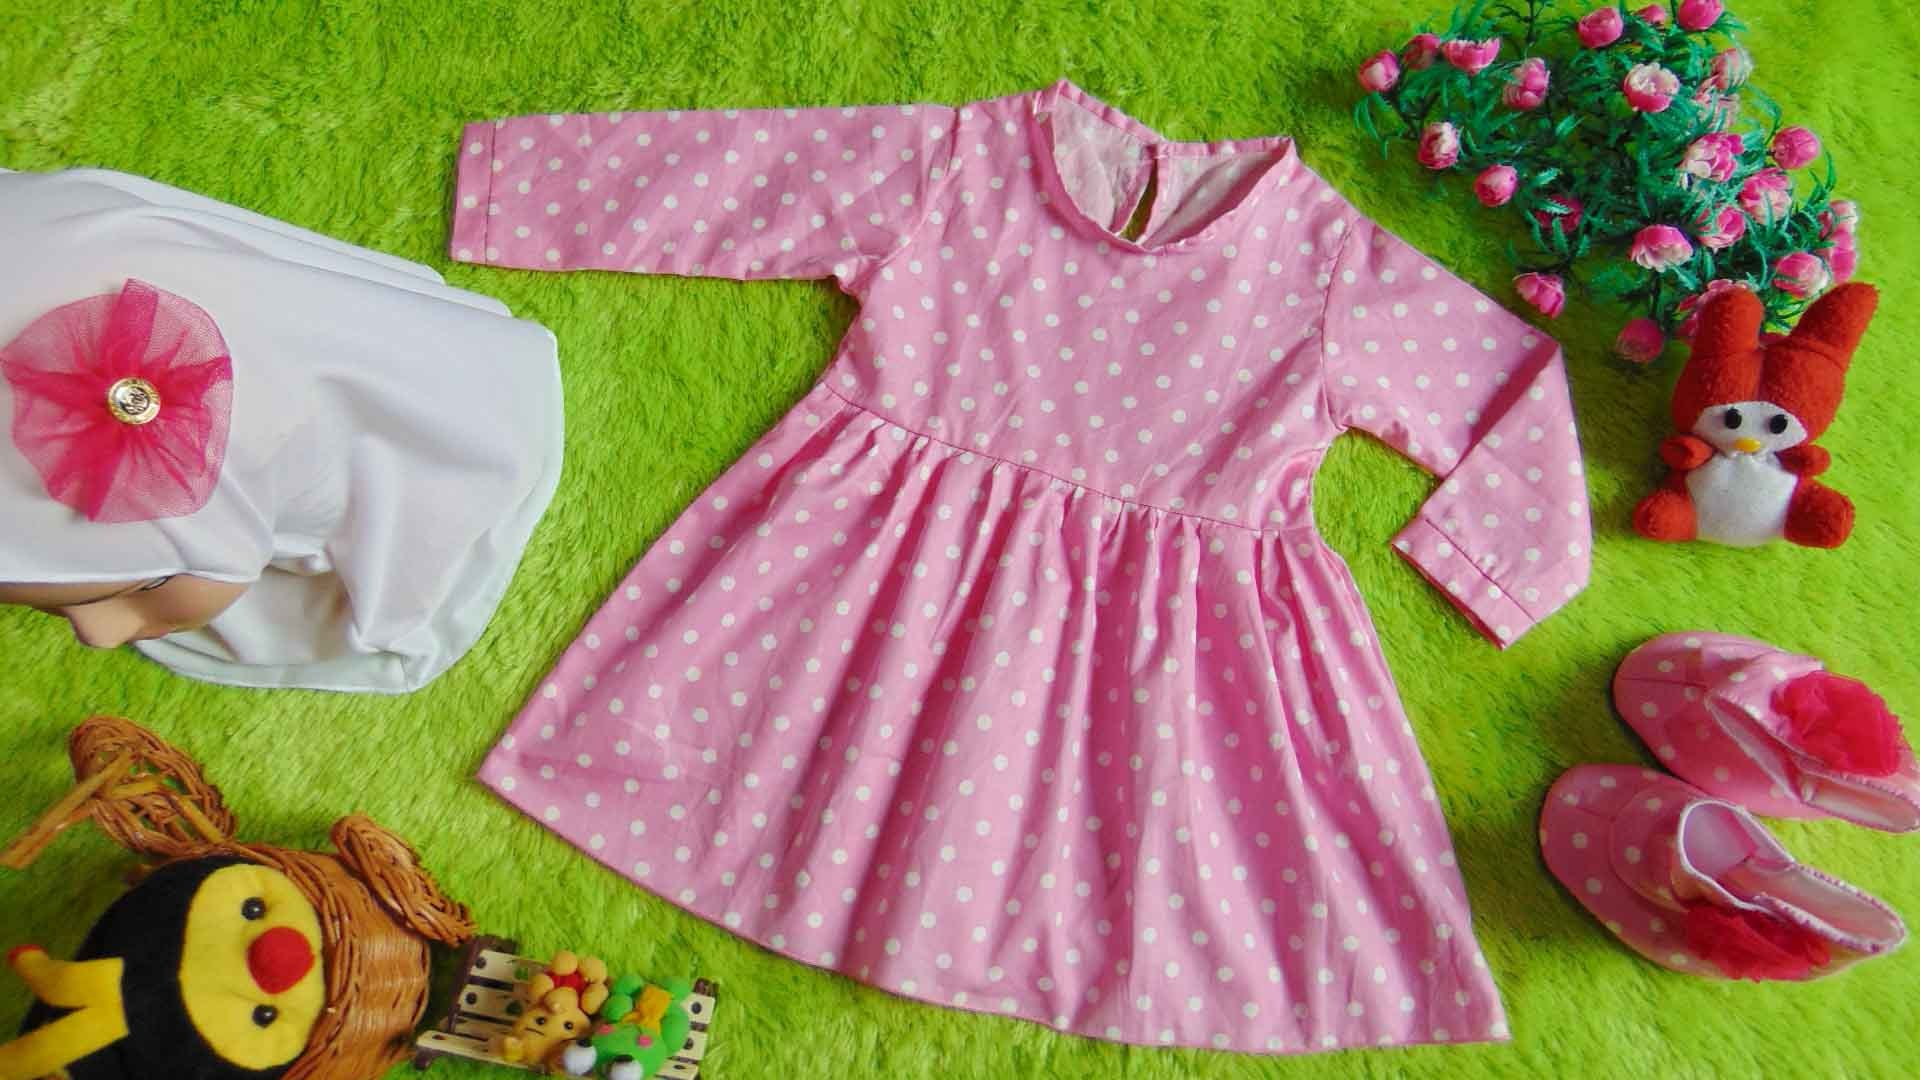 Model Baju Lebaran Perempuan 2018 S1du Baju Lebaran Untuk Bayi Perempuan Nusagates